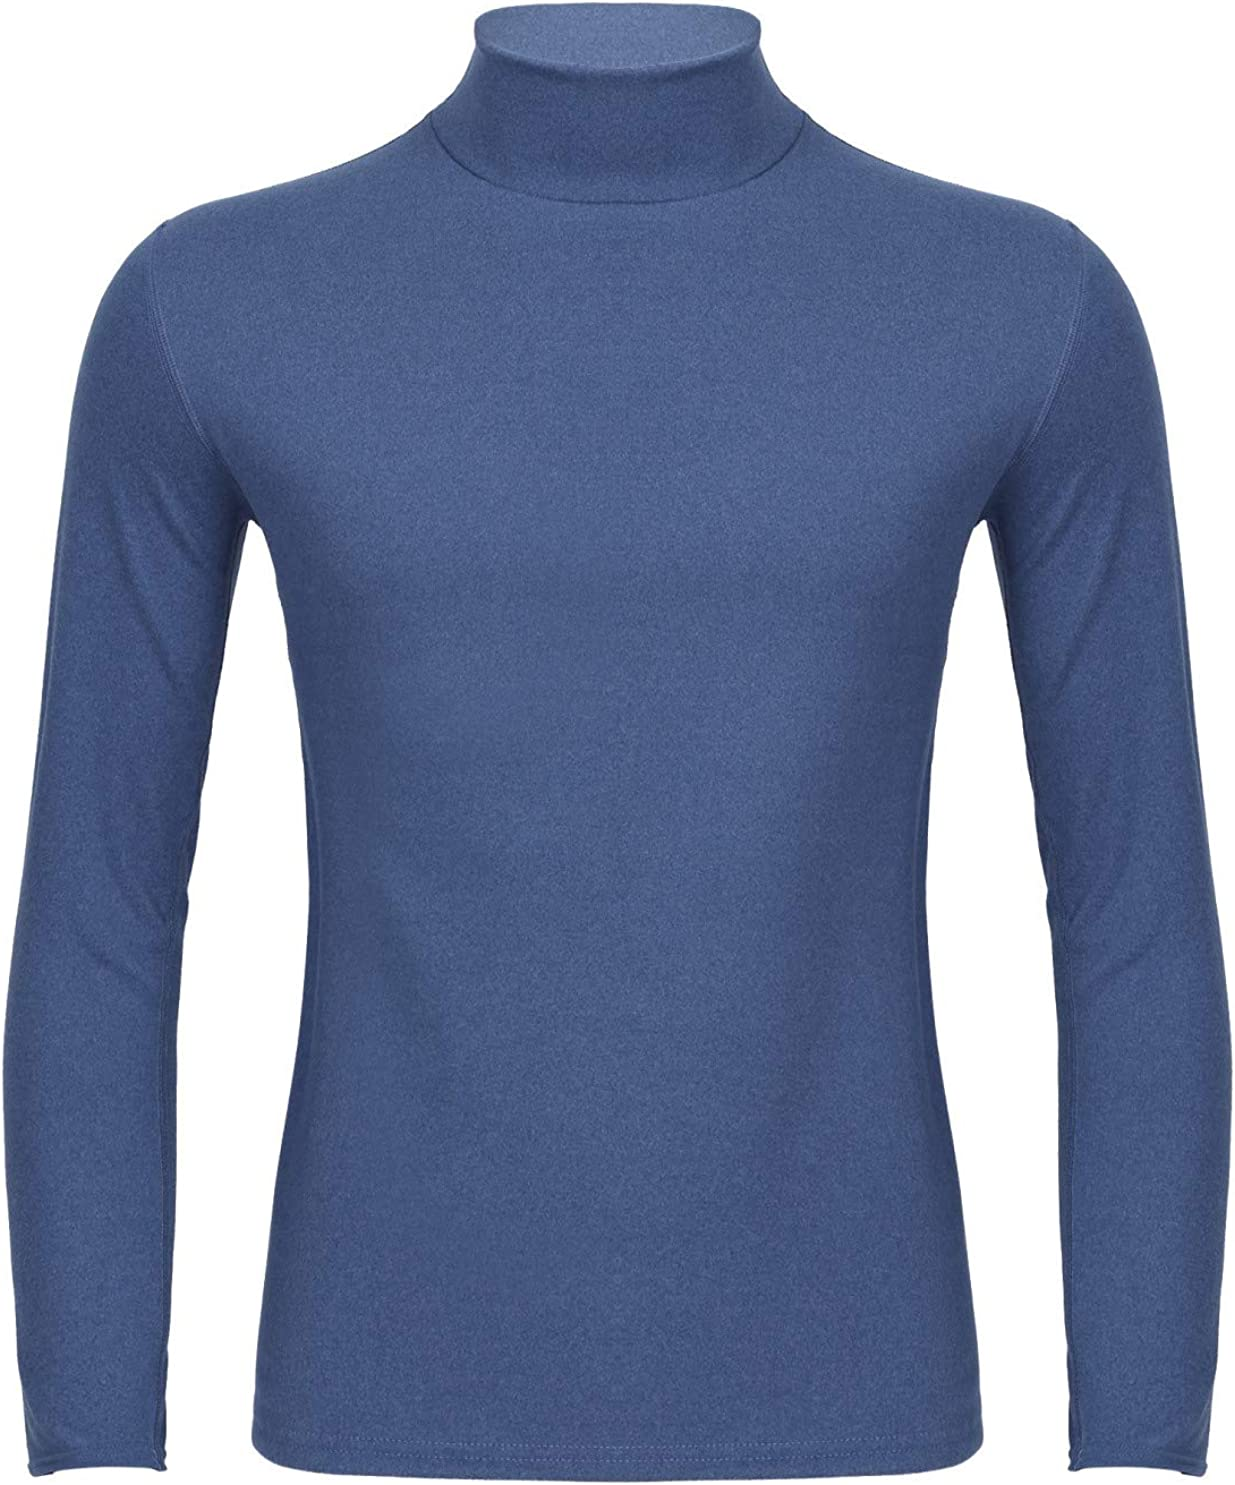 Hularka Mens Thermal Top Base Layer Shirts Long Sleeve Turtleneck Slim Fit T-Shirts Undershirts